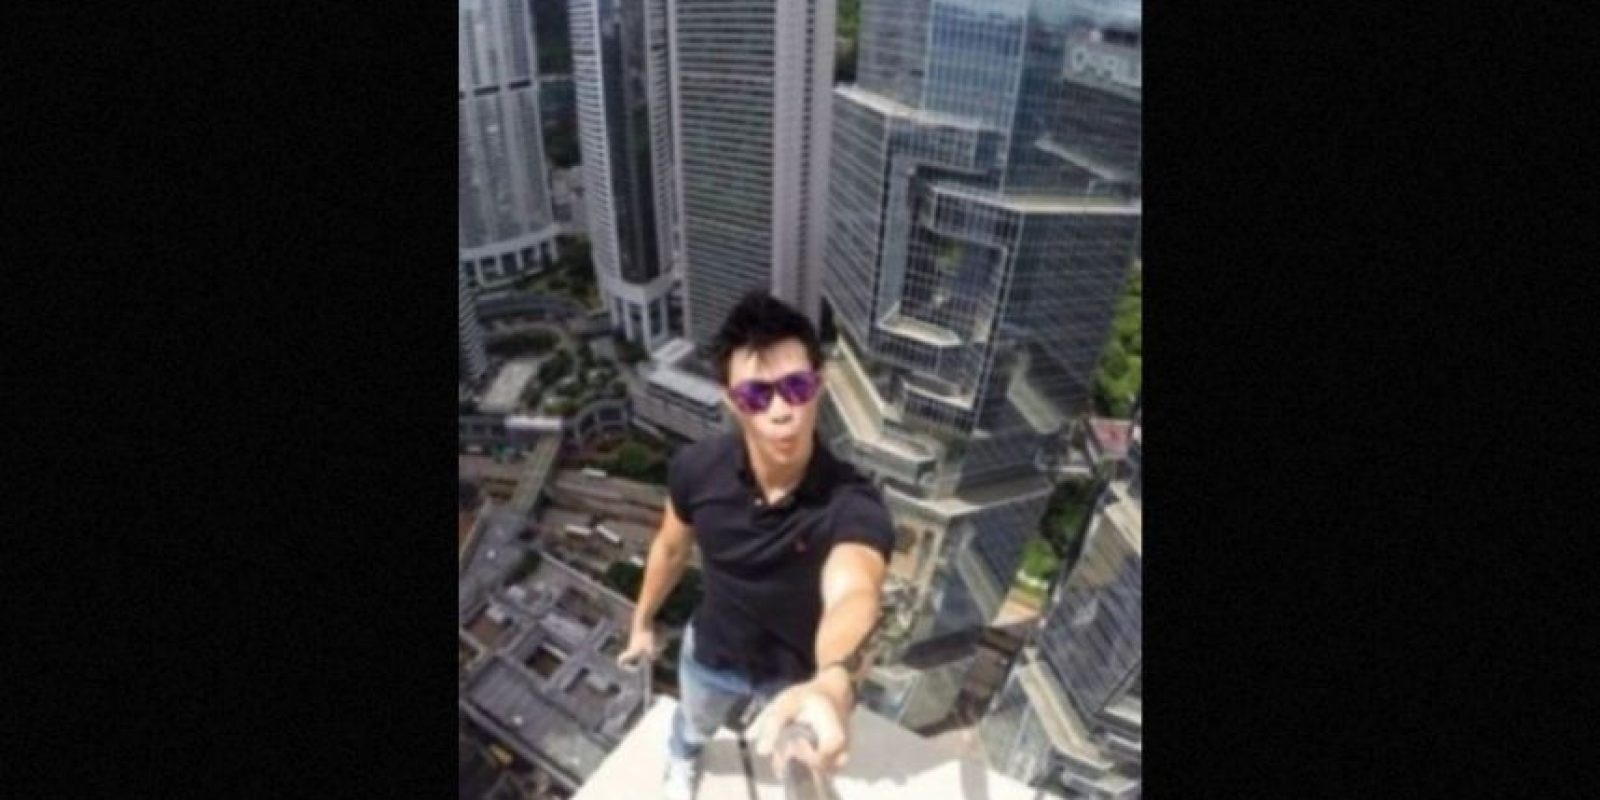 Los selfies famosos de Internet Foto:instagram.com/daniel__lau